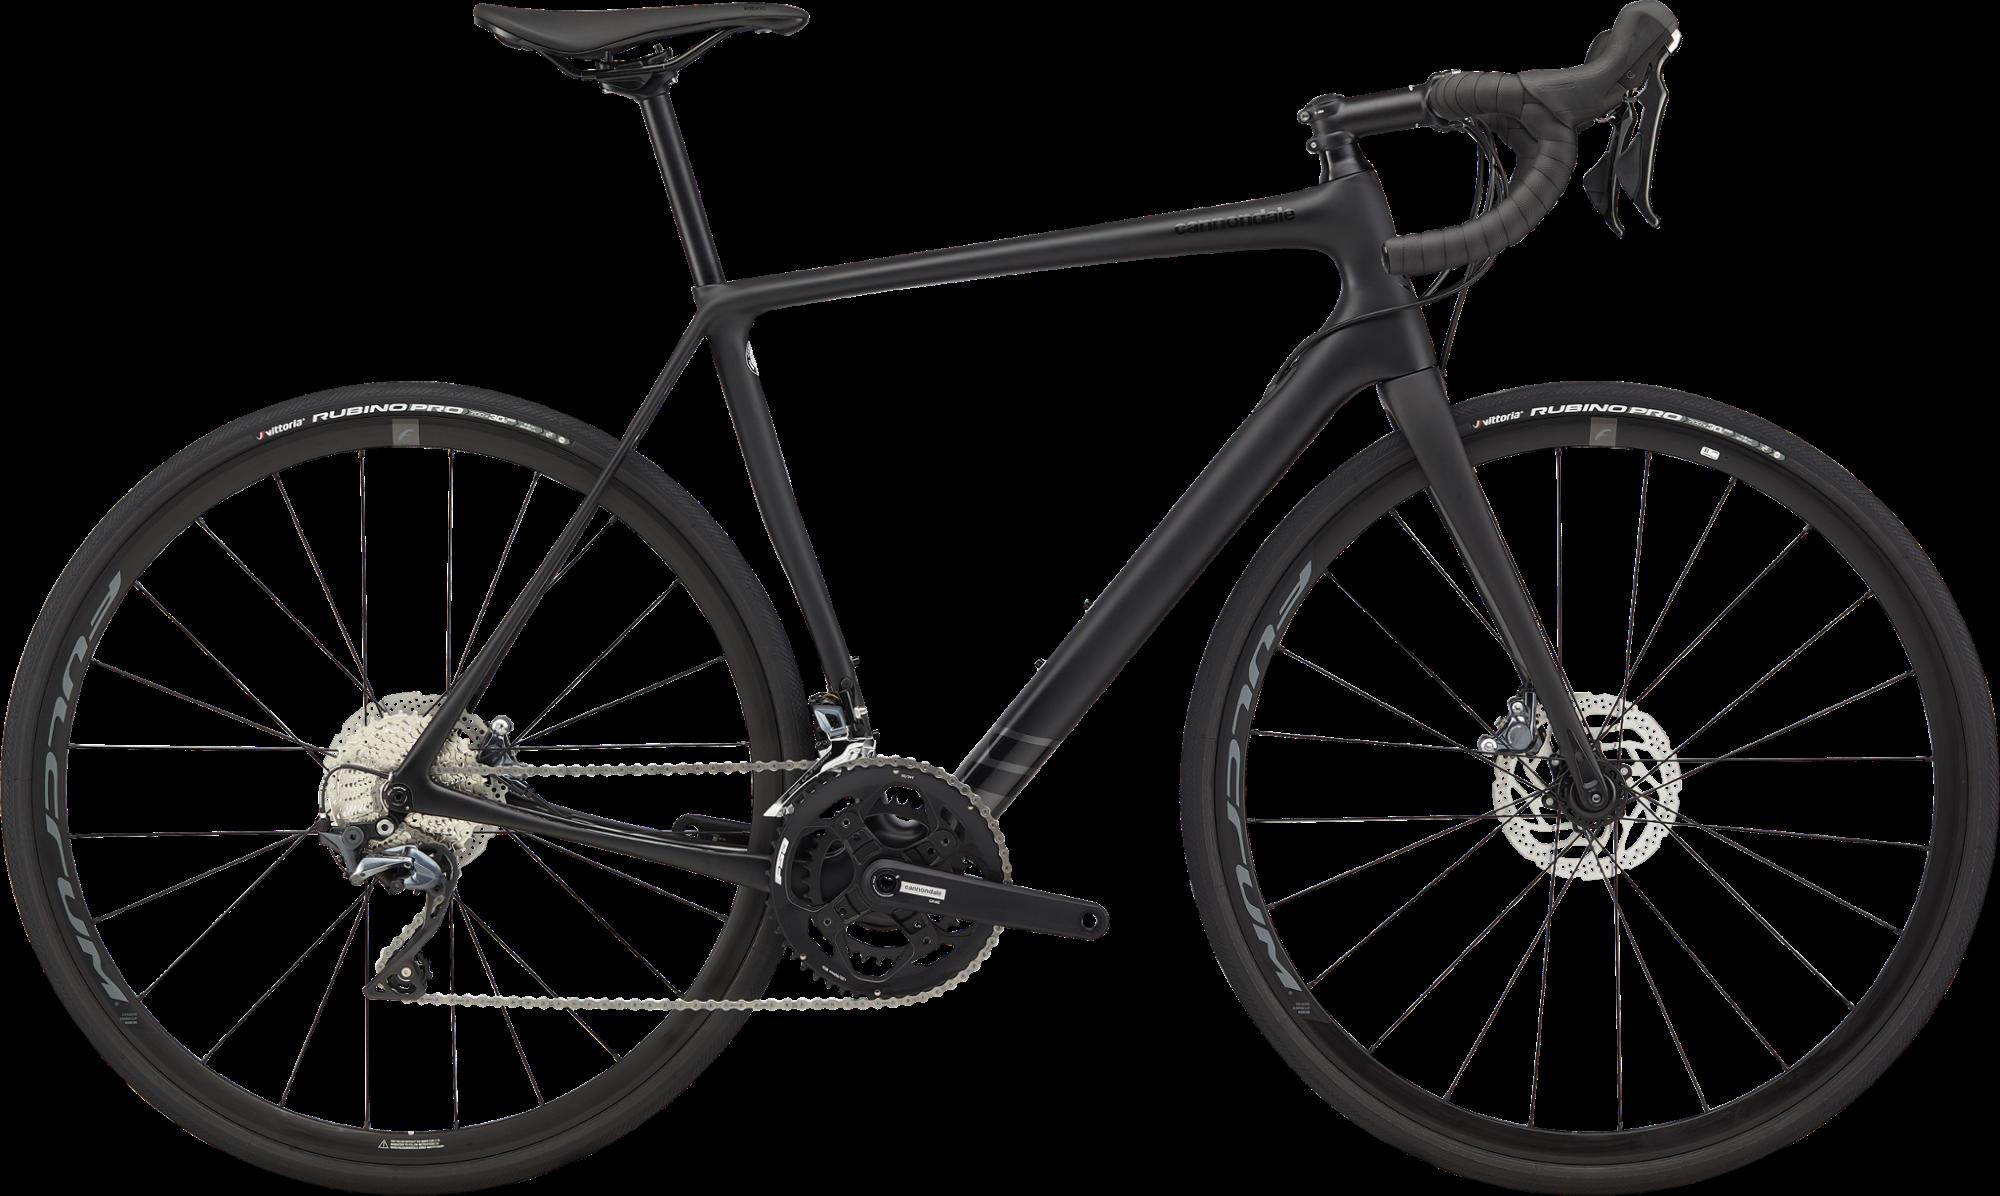 Cannondale Synapse Ultegra Disc Carbon Road Bike 2021 Graphite